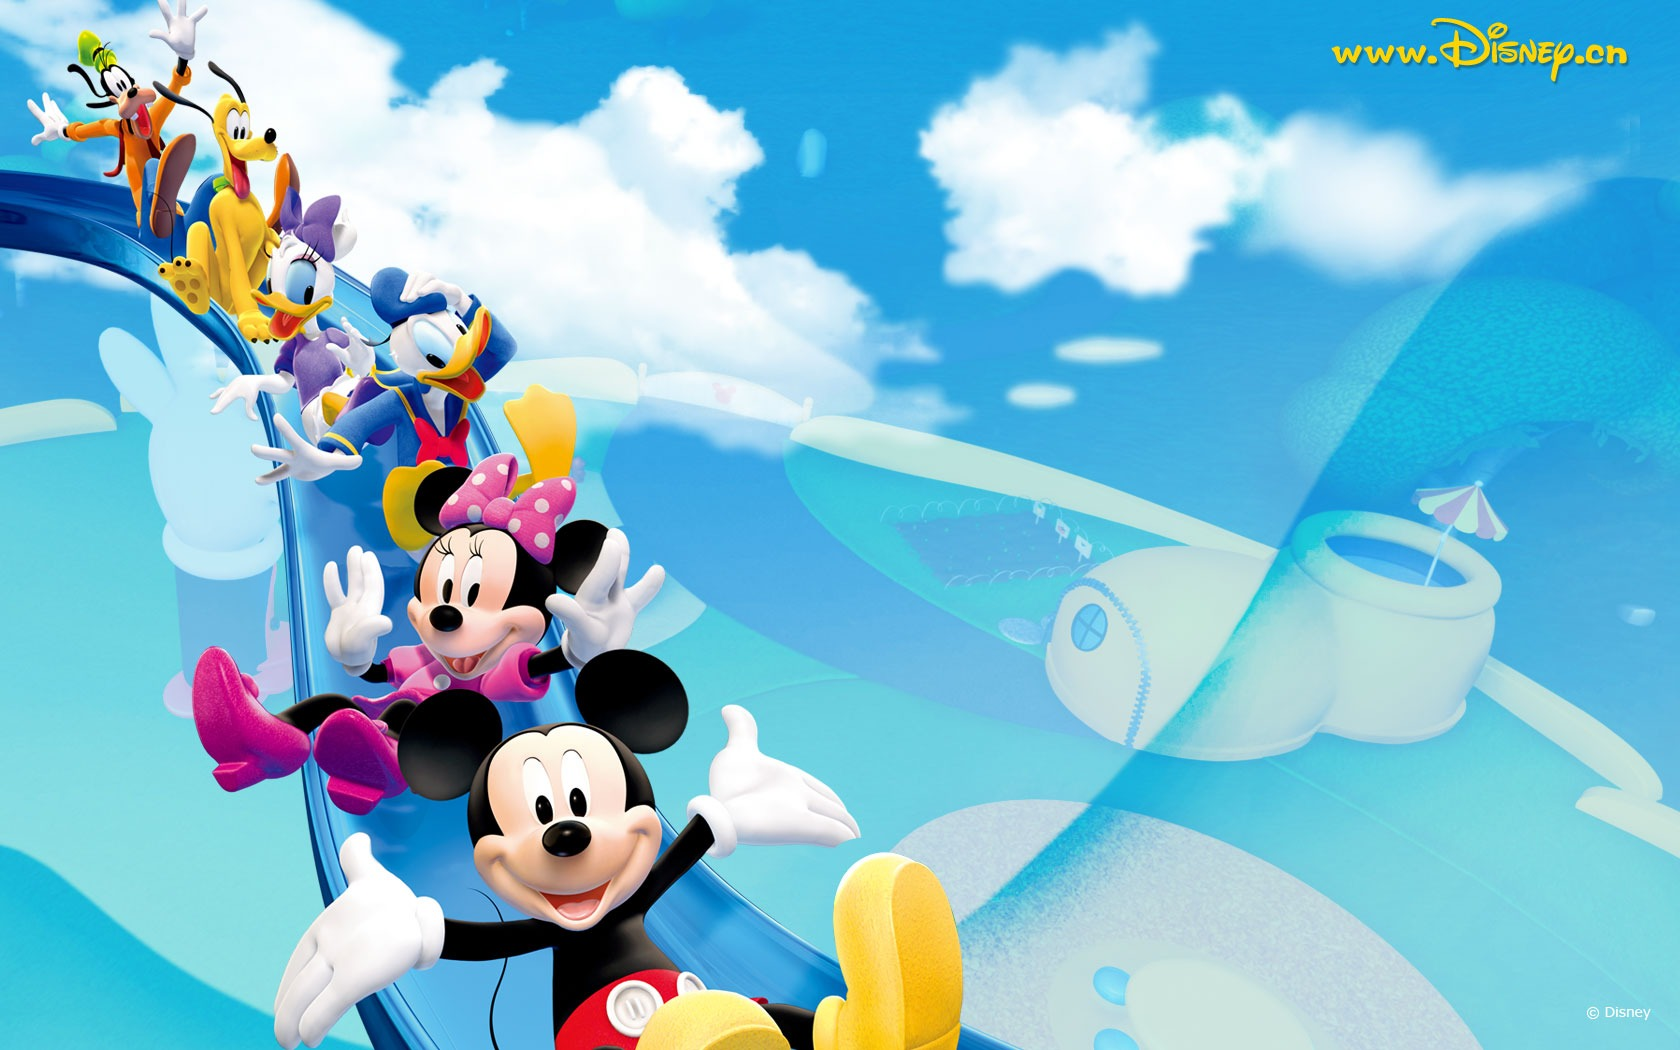 Fondos De Mickey Mouse Wallpapers Mickey Mouse Hd Gratis